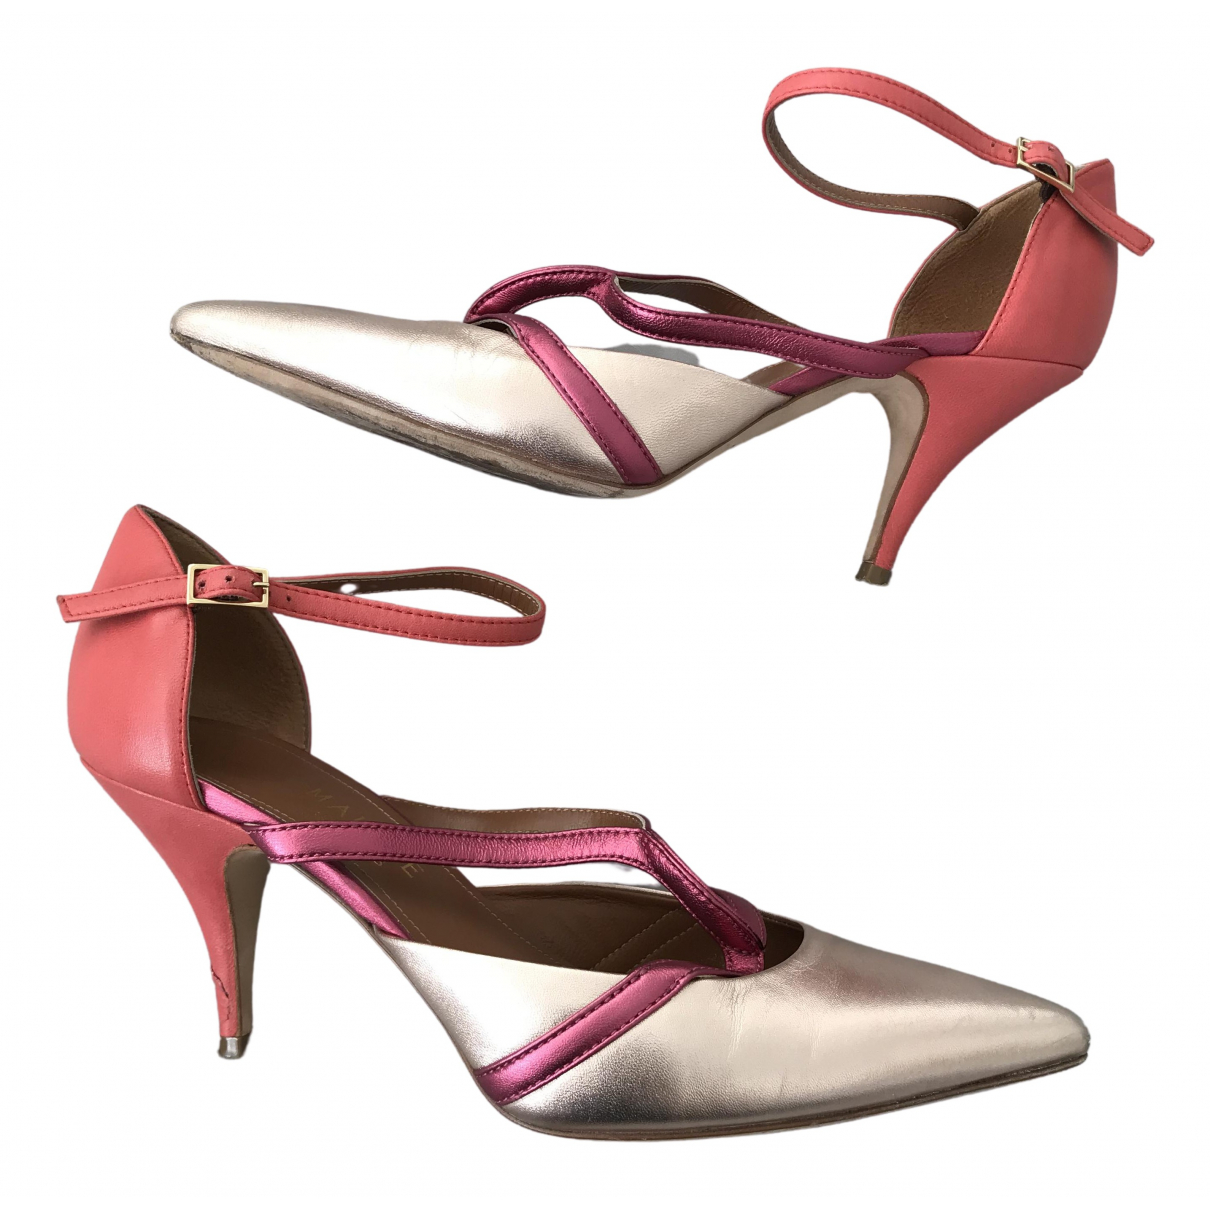 Malone Souliers \N Pink Leather Heels for Women 38 IT